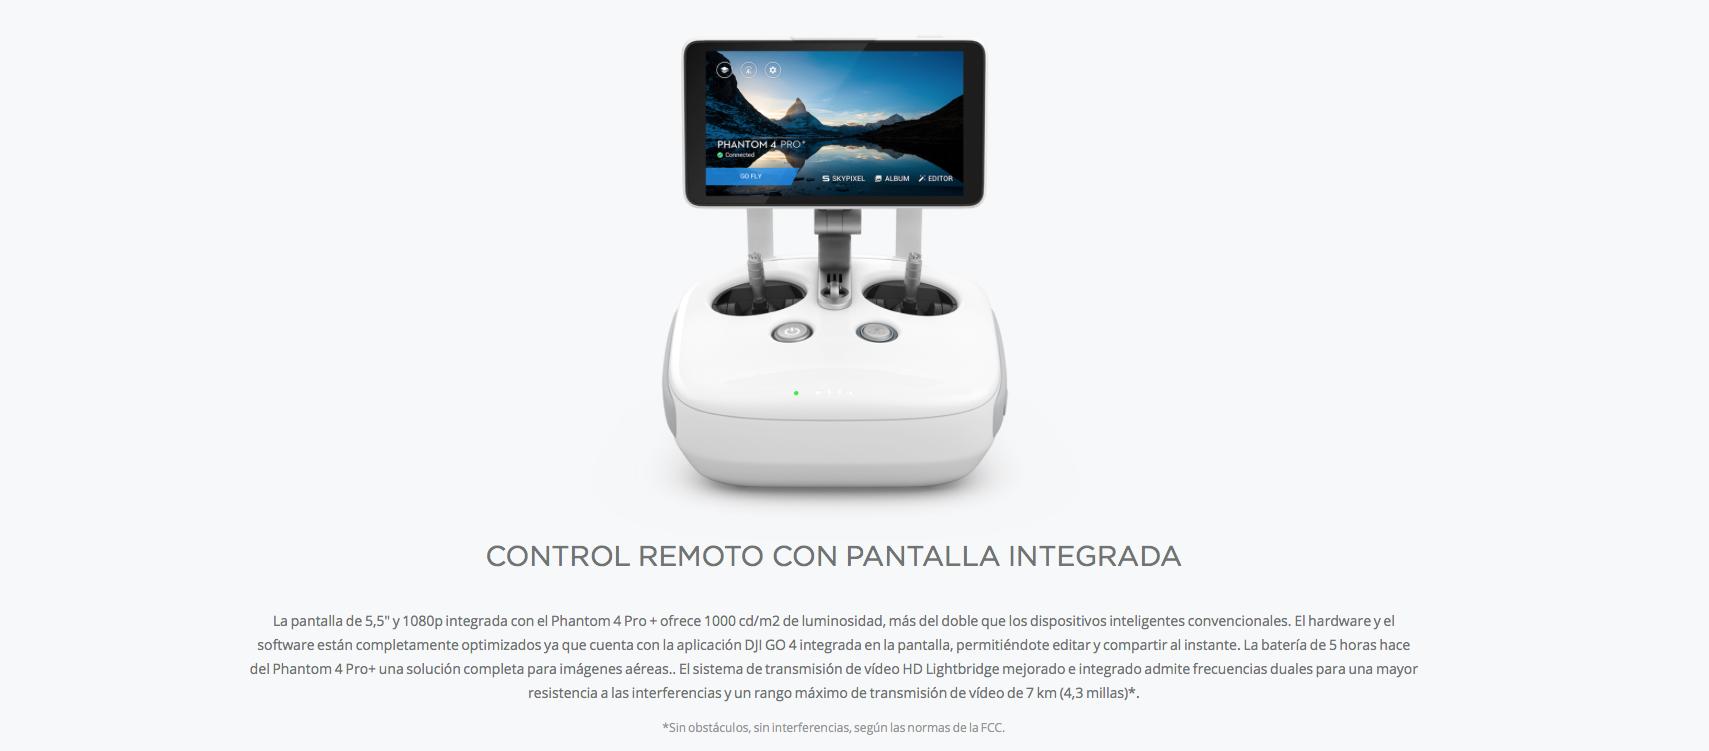 Control remoto con pantalla integrada